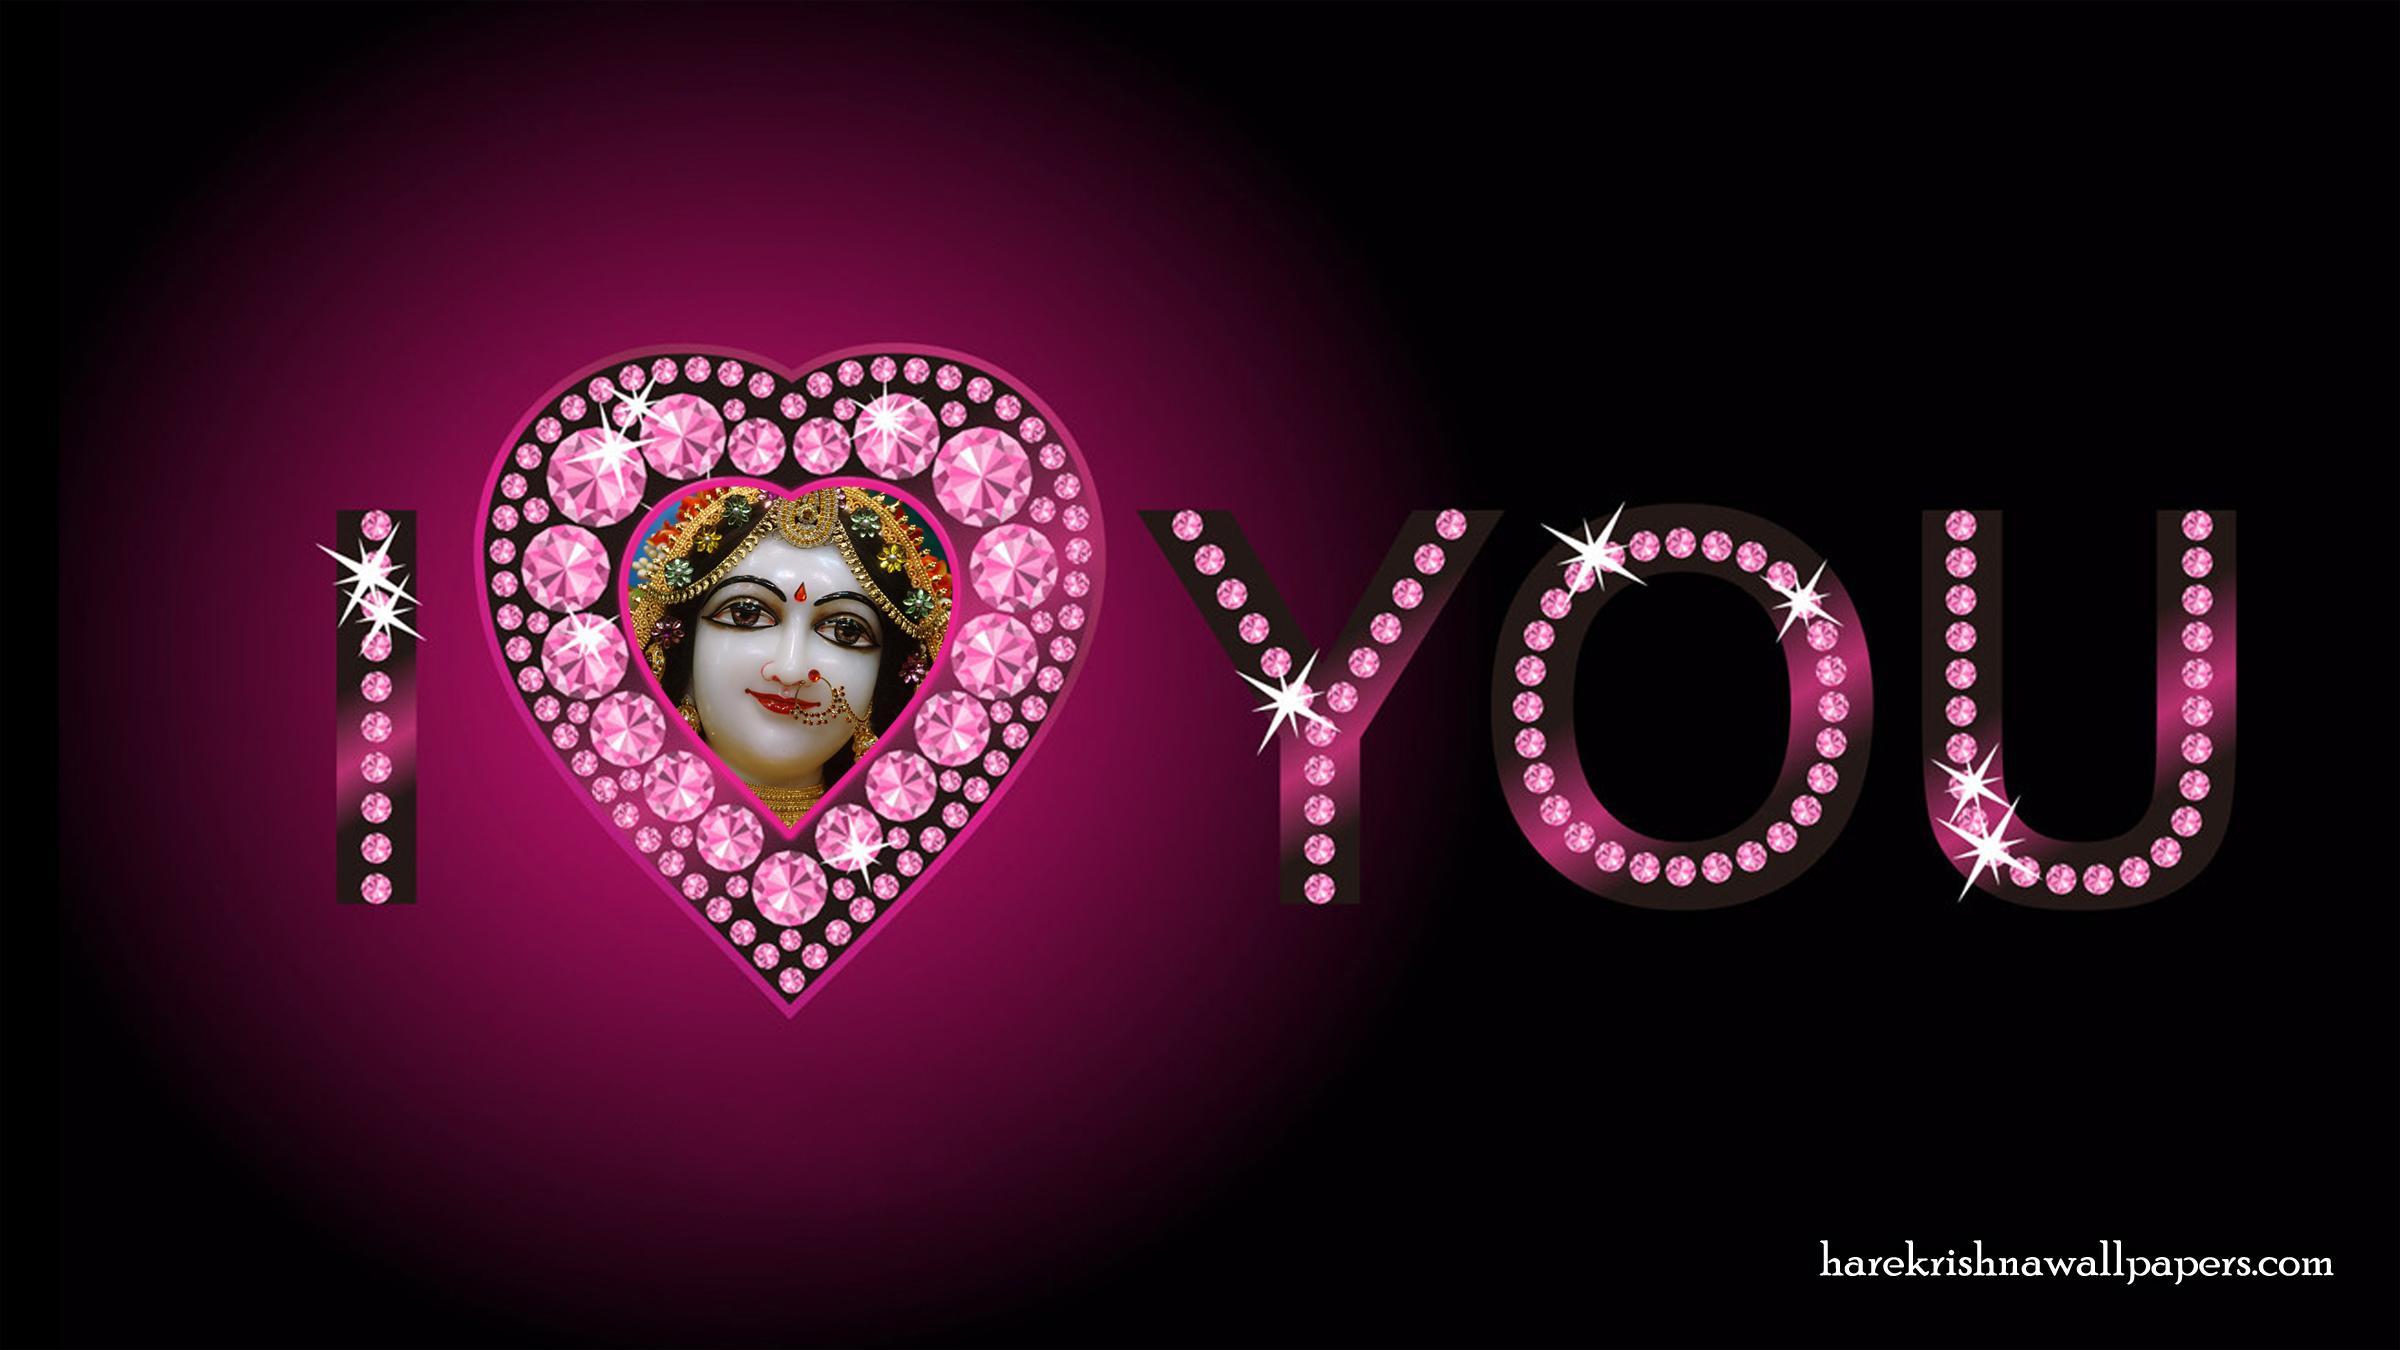 I Love You Radharani Wallpaper (012) Size 2400x1350 Download